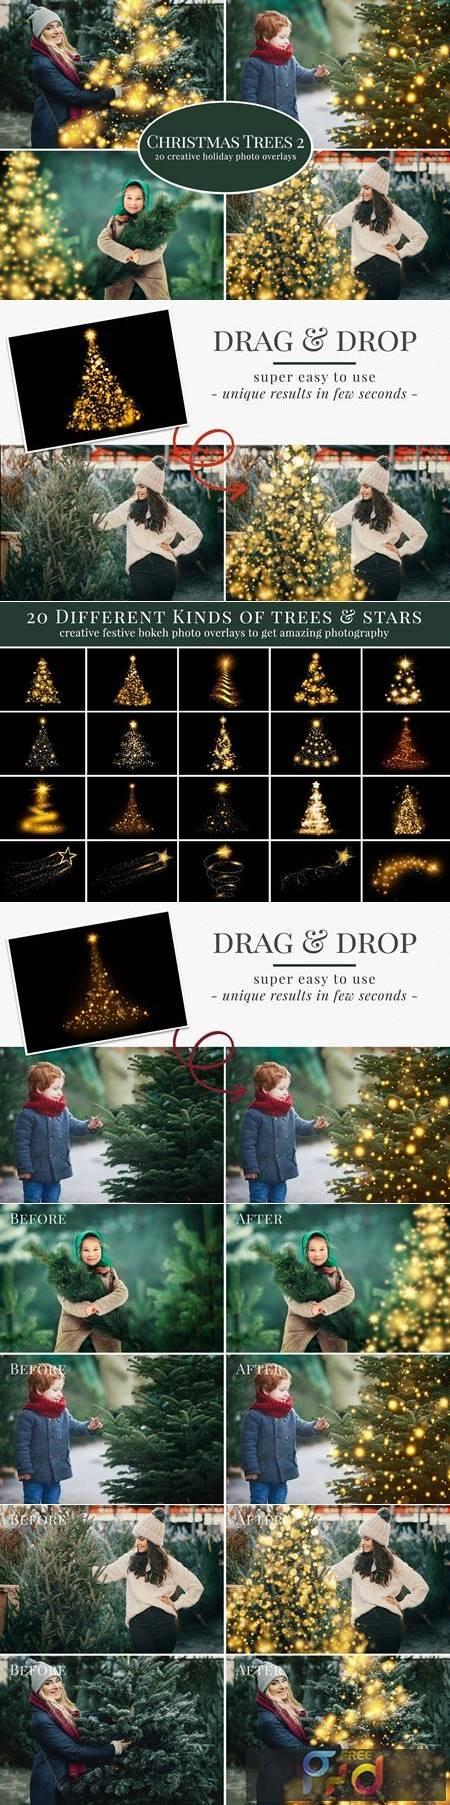 Christmas Trees photo overlays 5636334 1